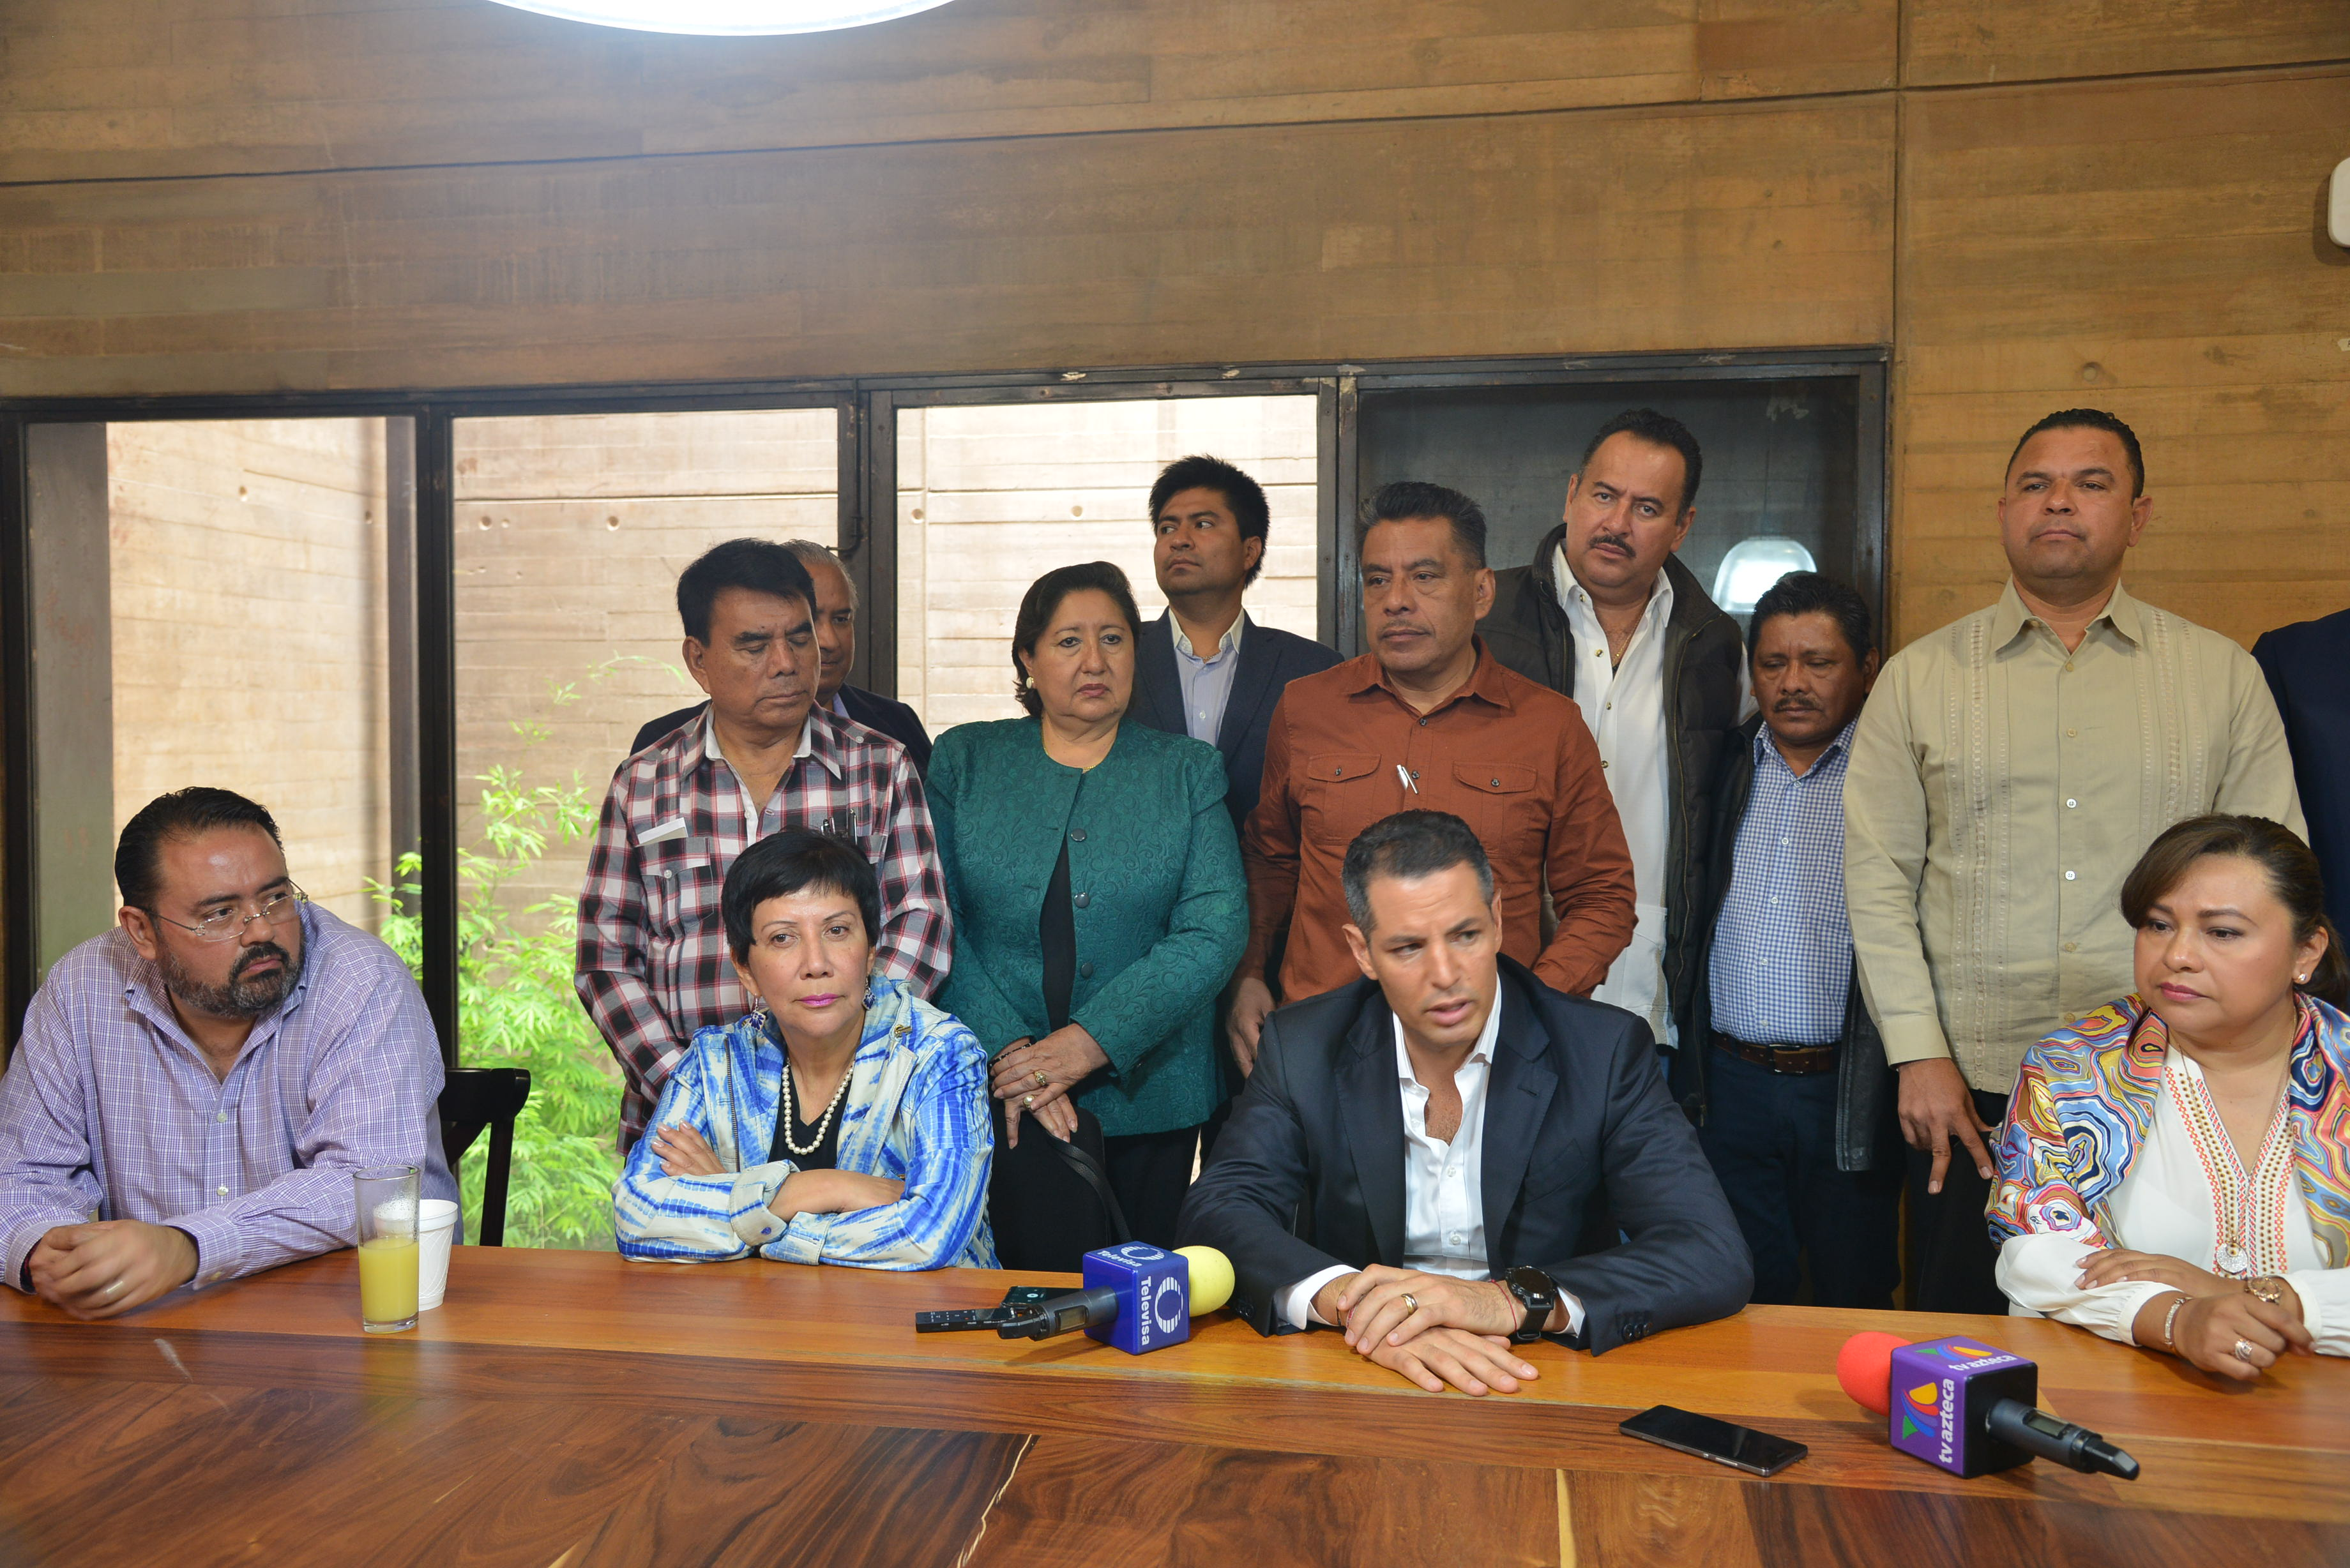 Sismo de 2.6 grados con epicentro en Tlalpan sacude sur de CDMX